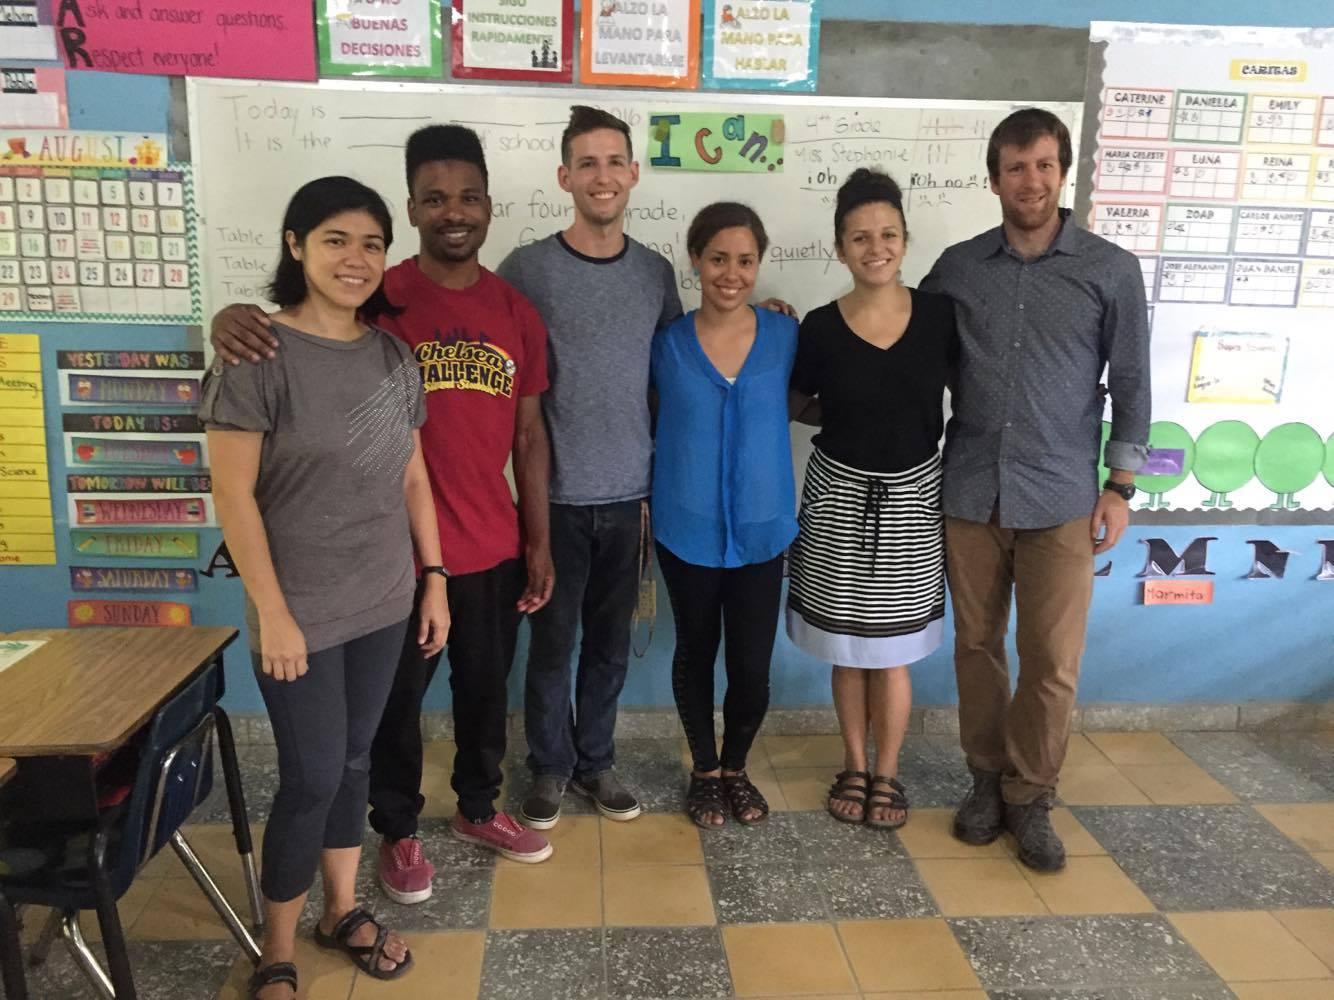 Miss Libian (Prepa teacher), Mr. Brian (2nd grade teacher), Mr. Sean (BECA Administrator), Miss Stephanie (4th grade teacher), Miss Laura (1st grade teacher), Mr. Tim (5th grade teacher)